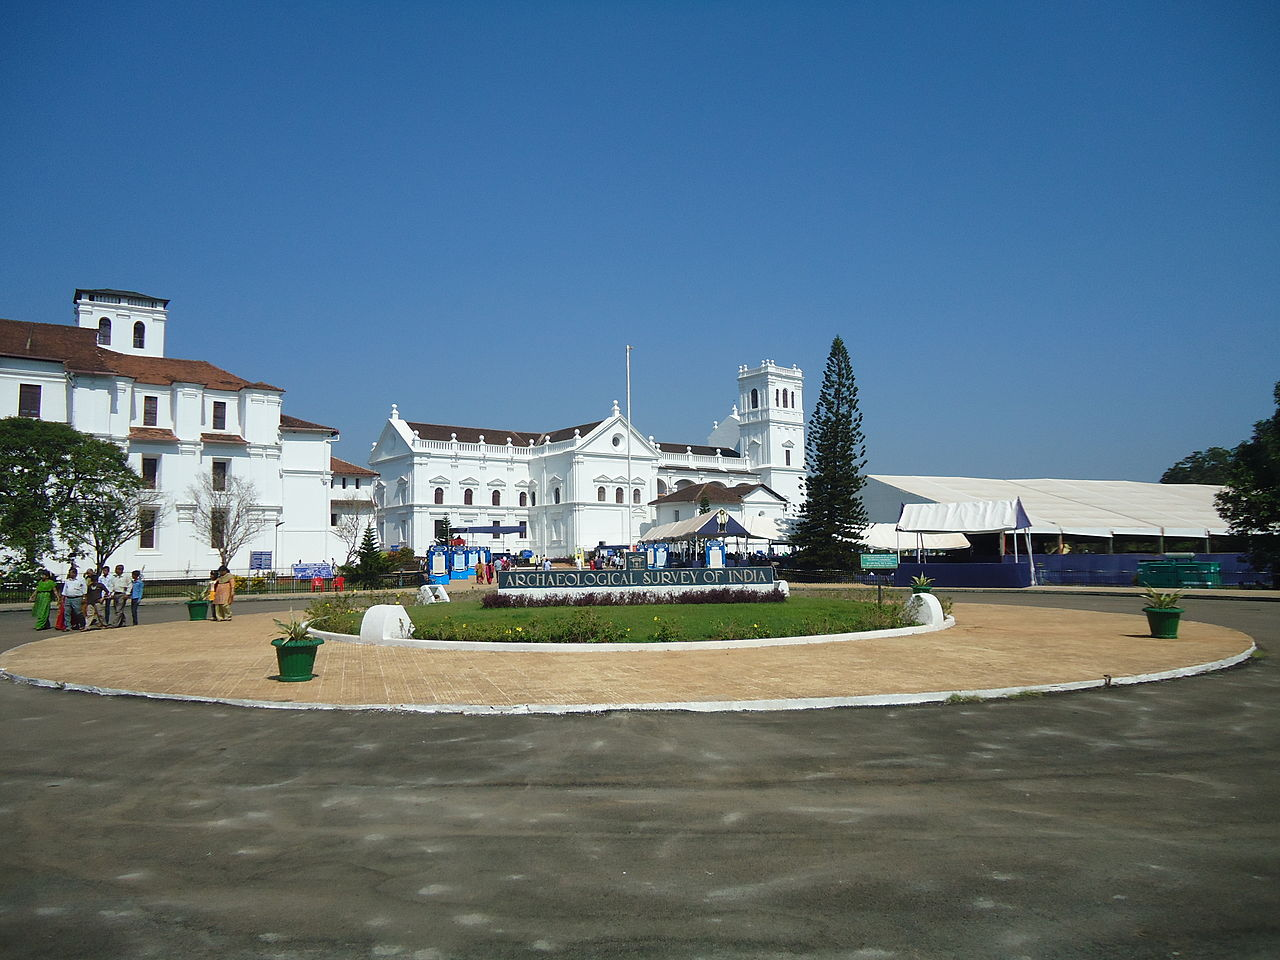 Top Goa Museum-Archaeological Museum